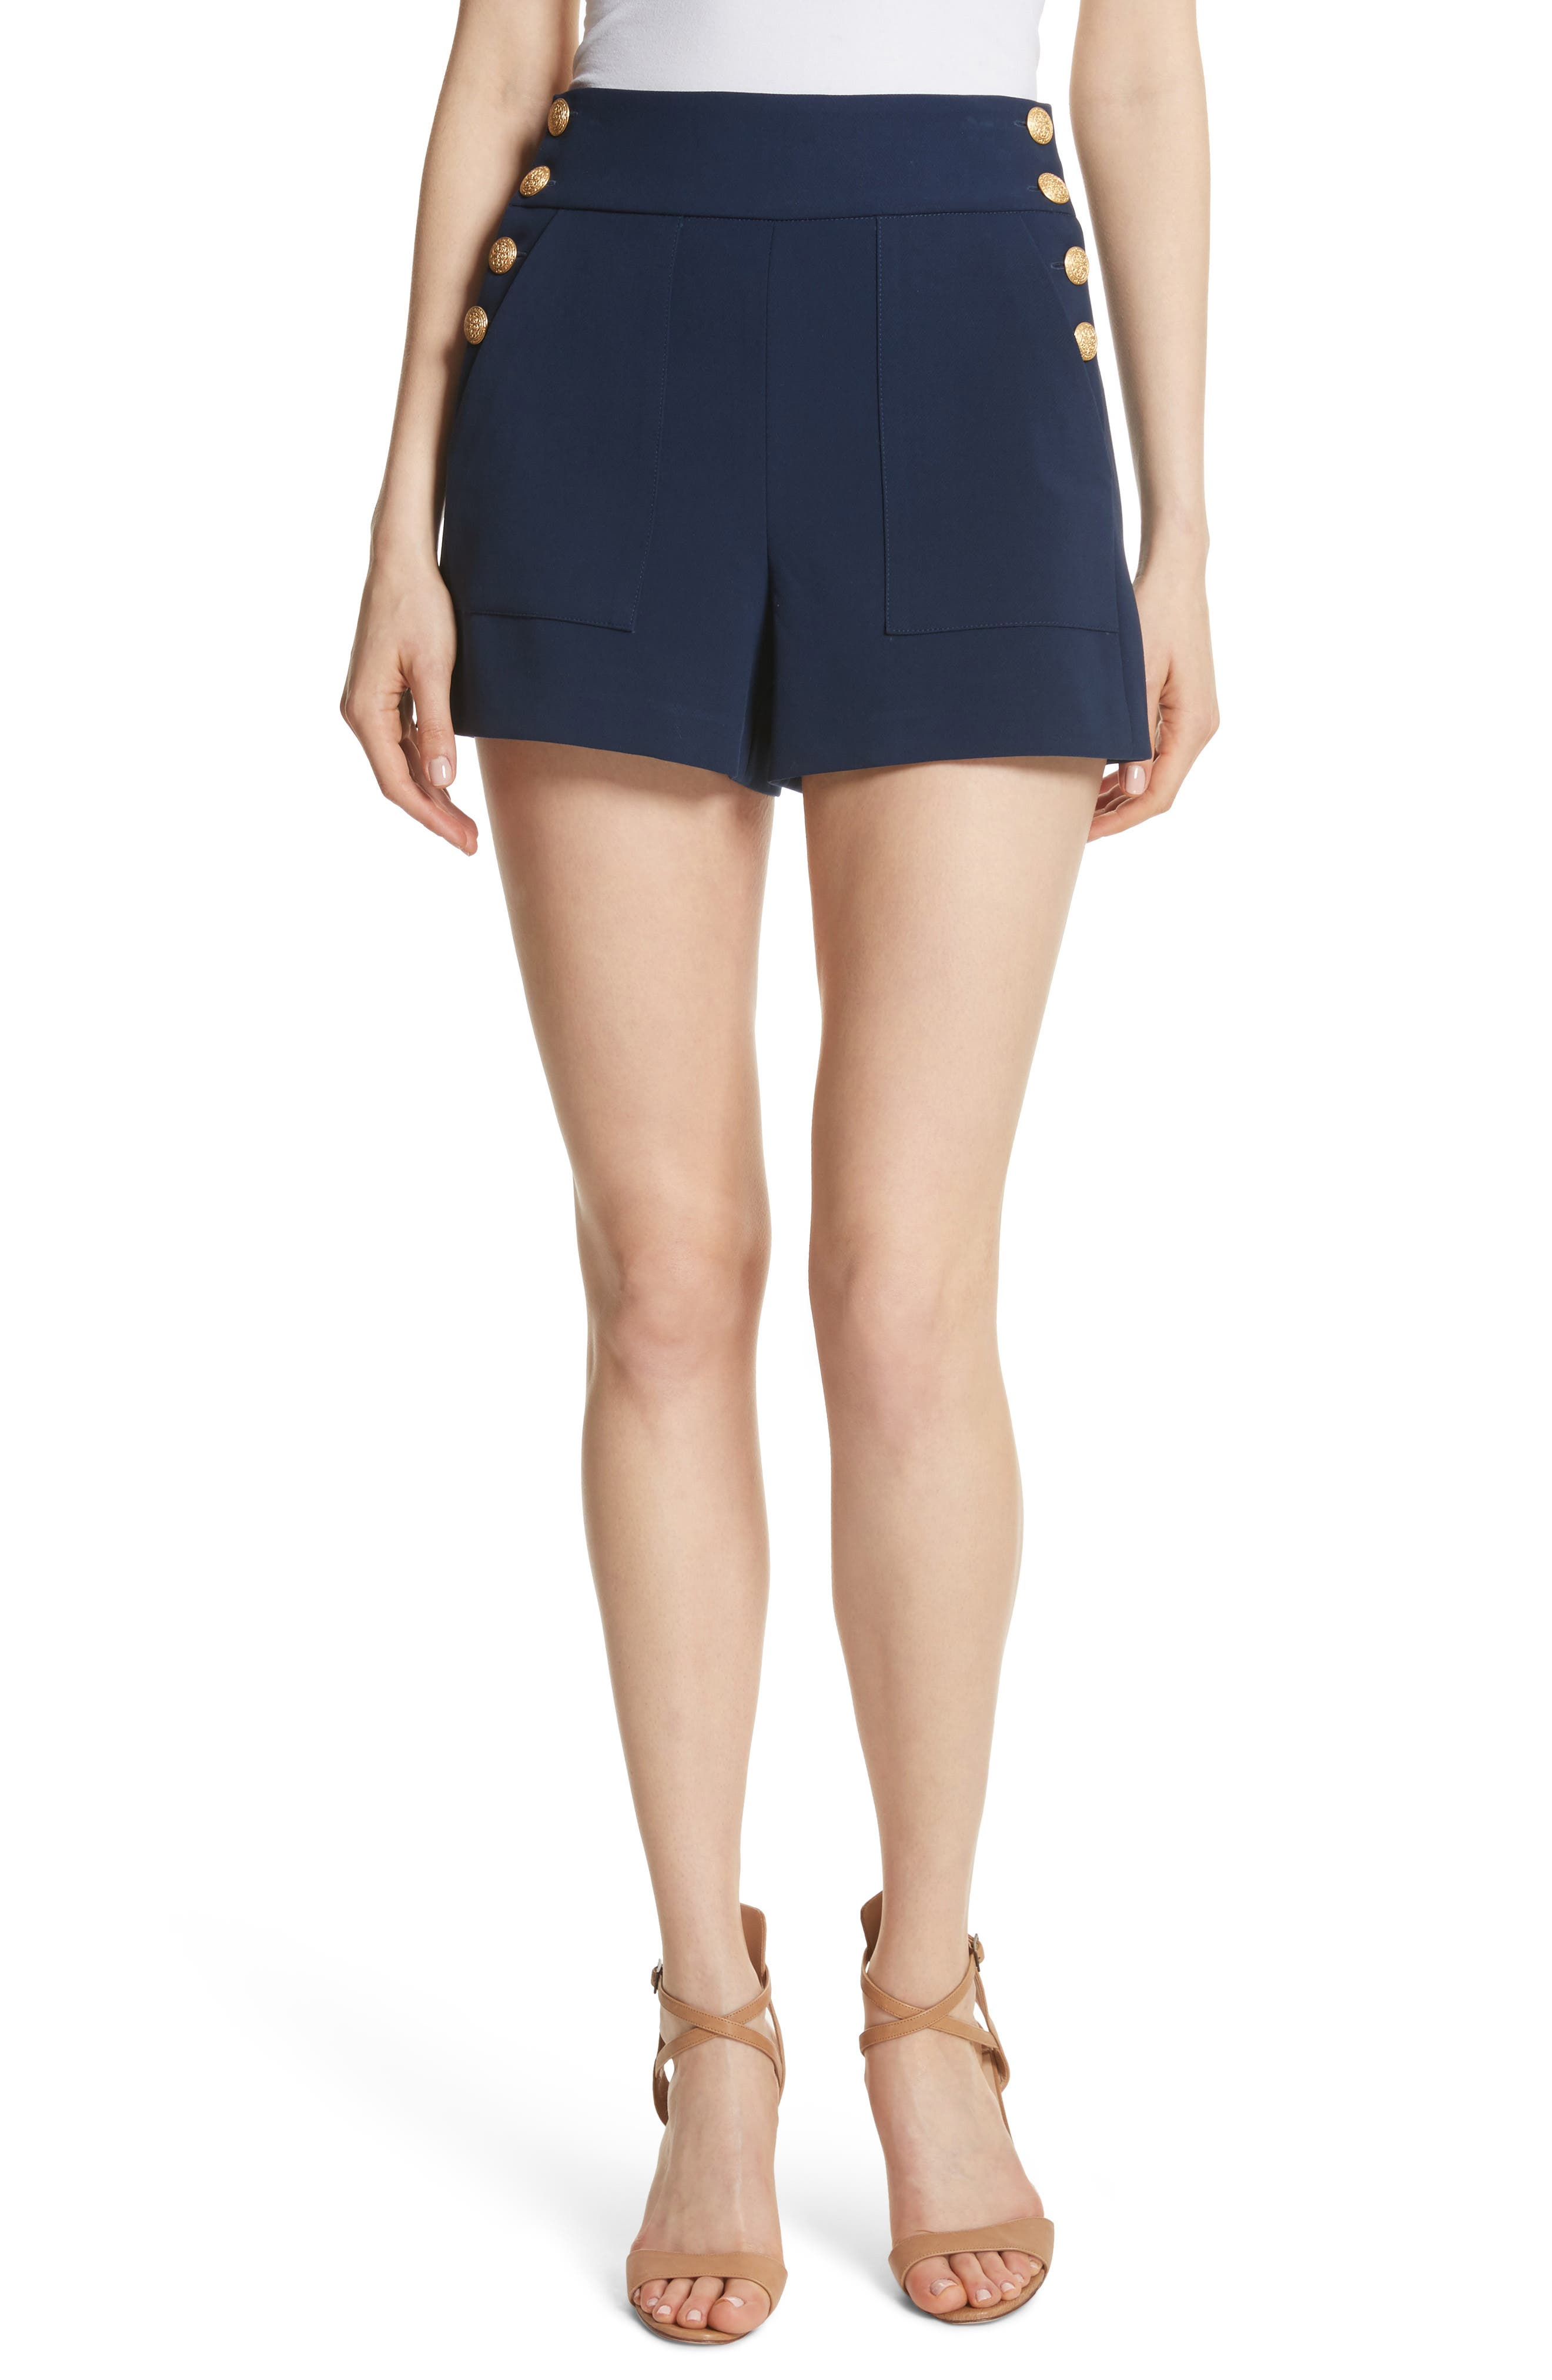 Donald High Waist Sailor Shorts,                         Main,                         color, Sapphire